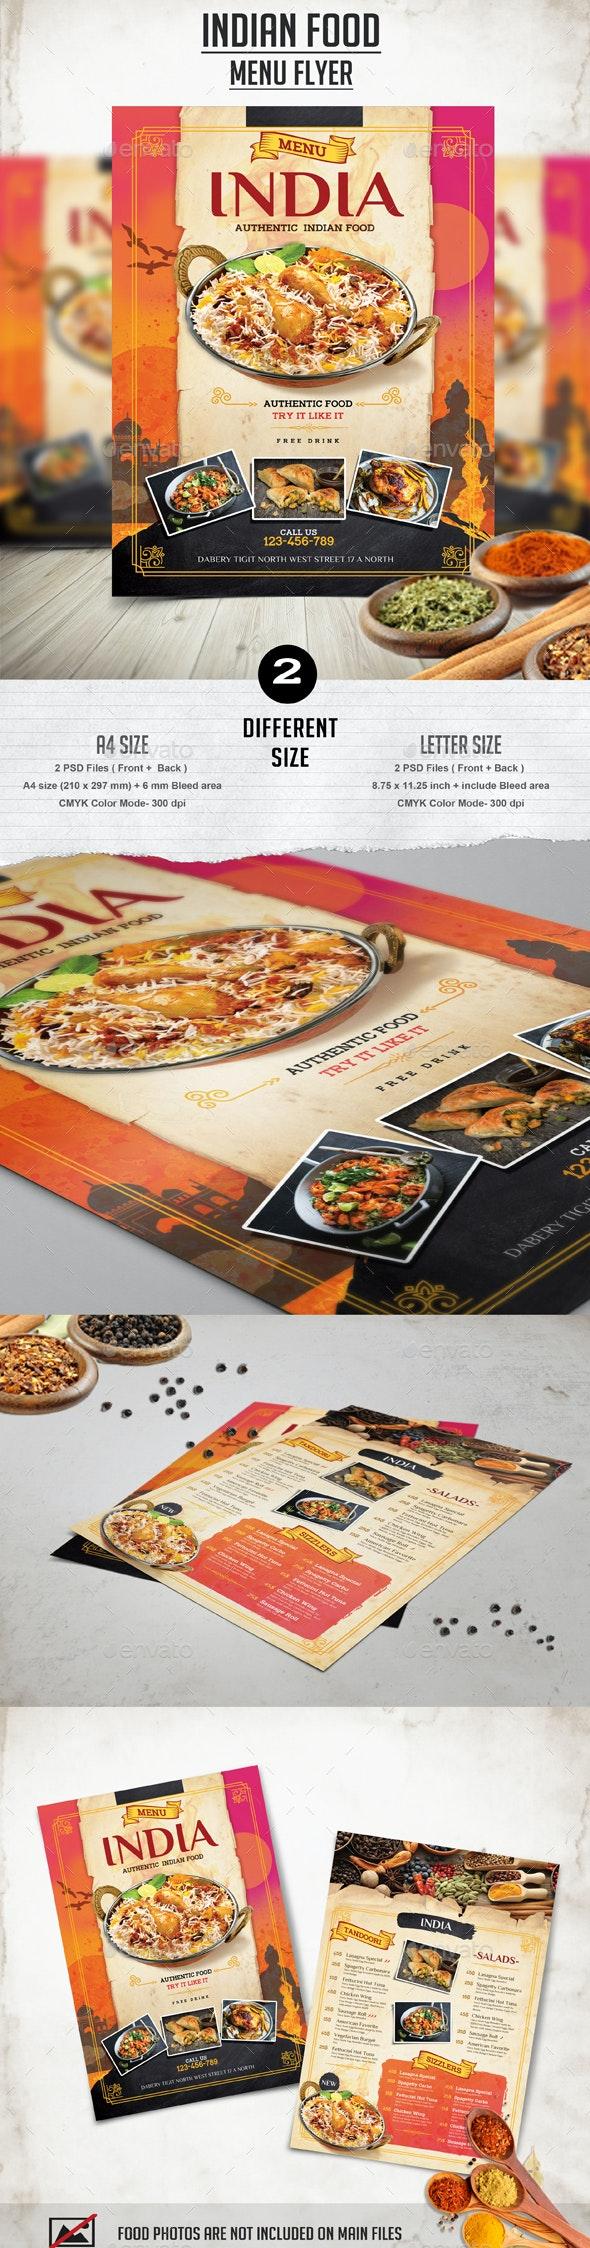 Indian Food Menu Flyer - Restaurant Flyers